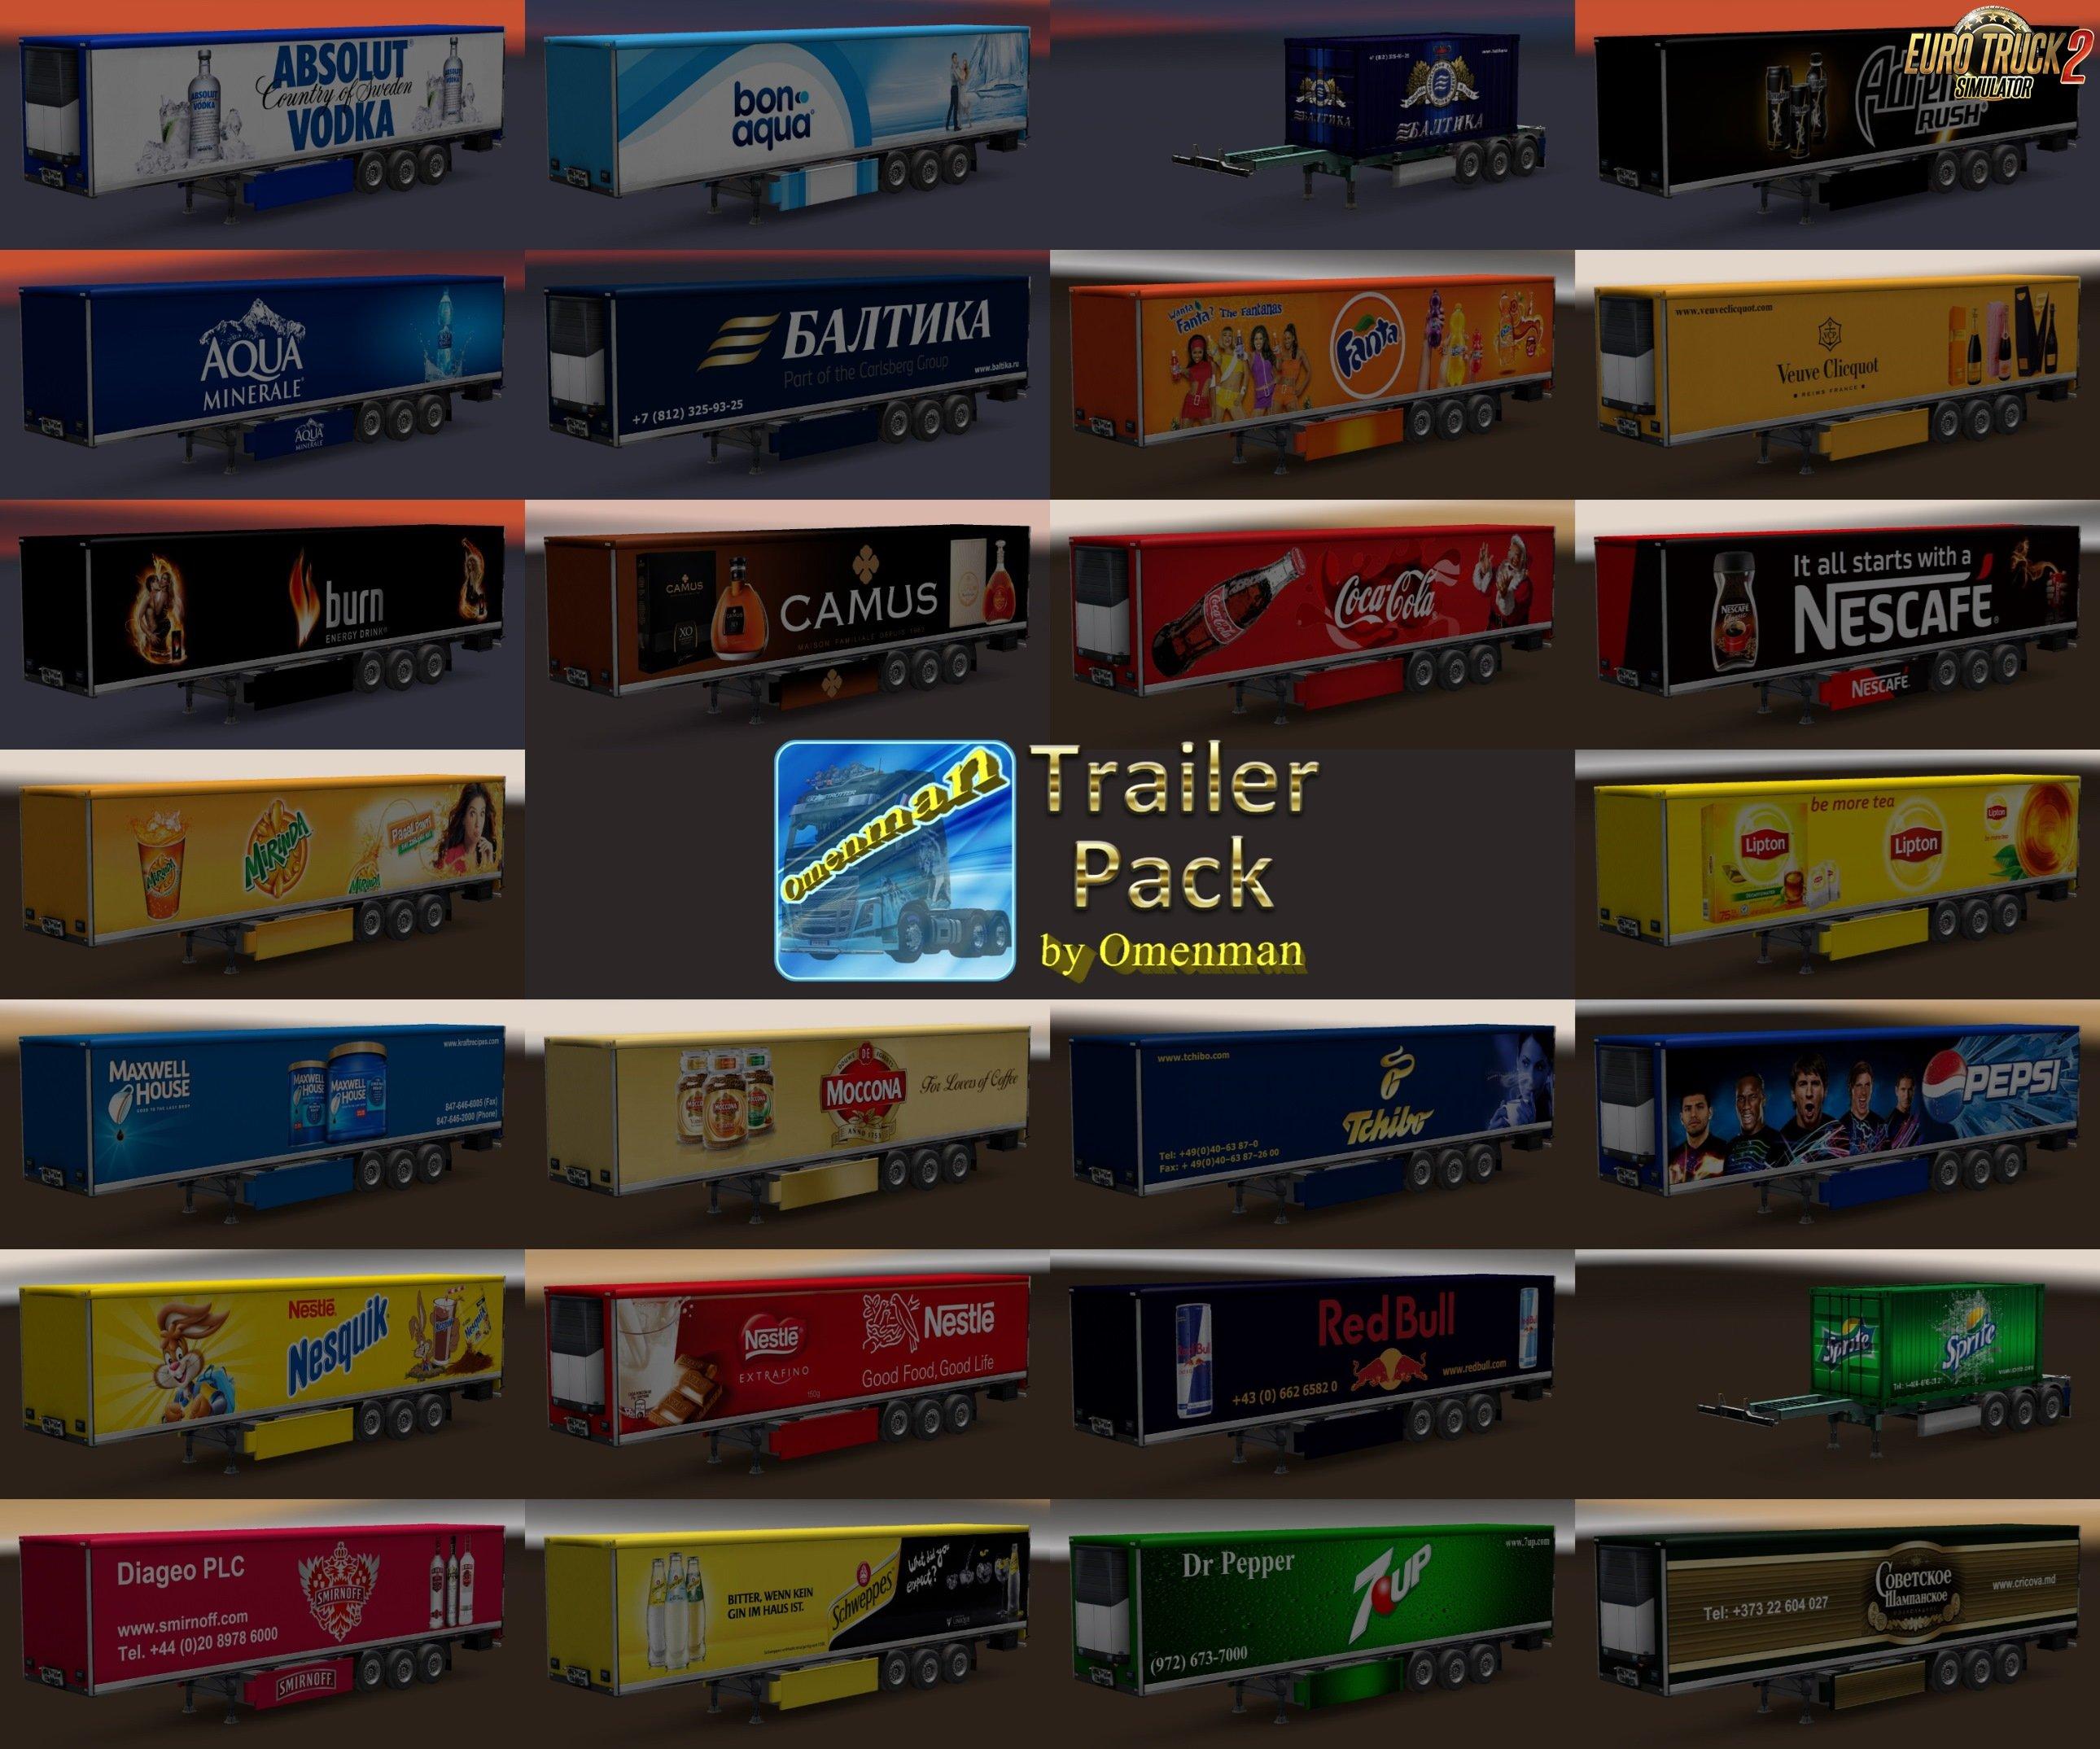 Trailer Pack Drinks v1.02.00 for Ets2